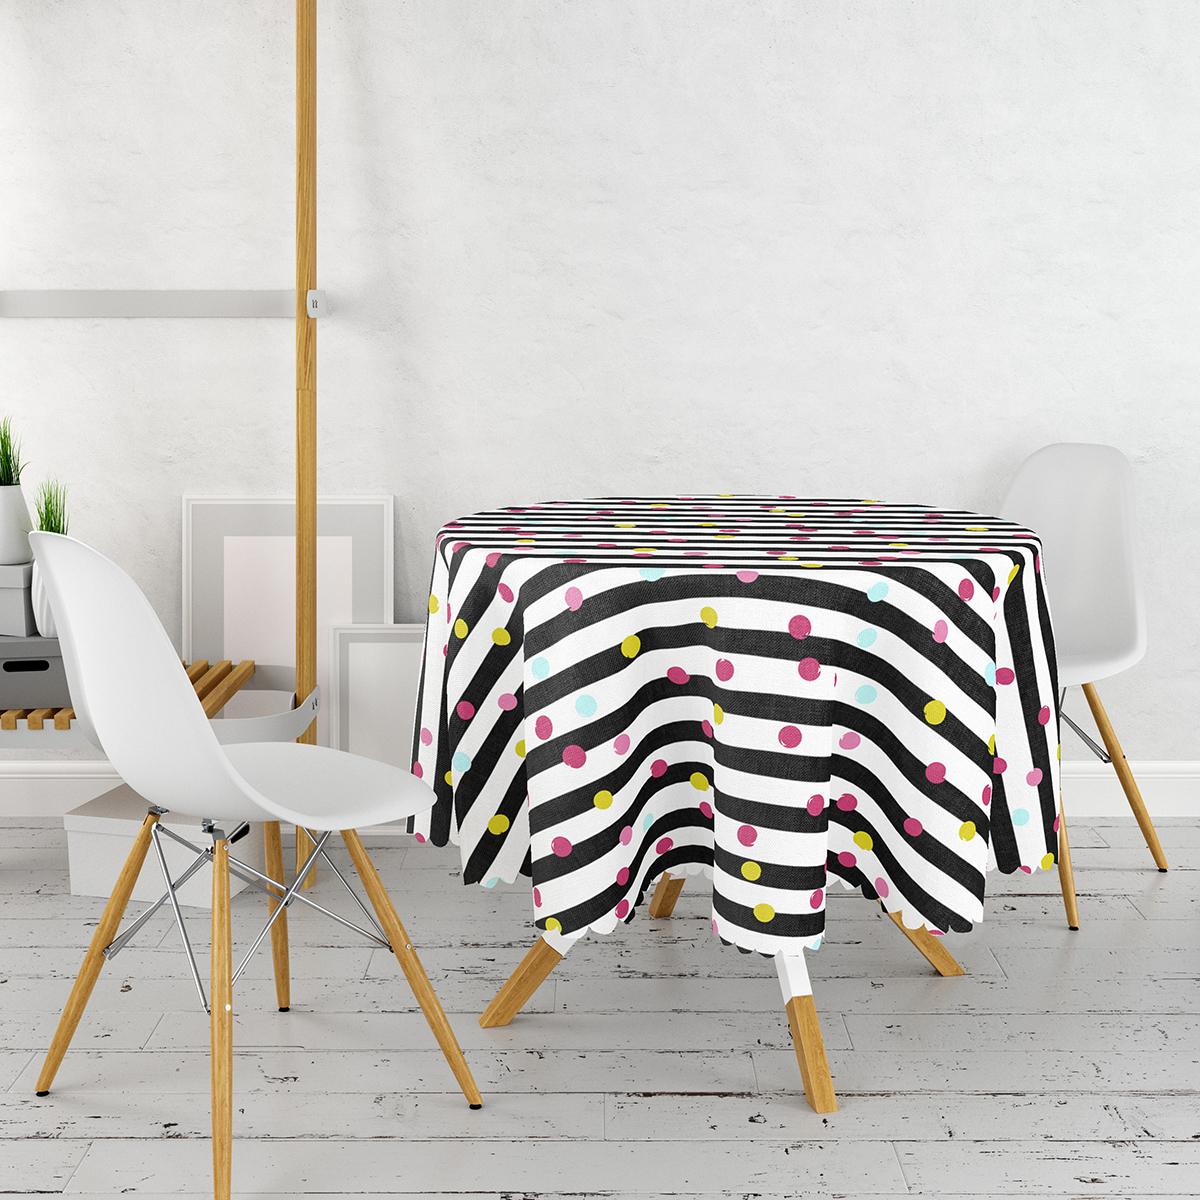 Beyaz Zemin Üzerinde Modern Siyah Çizgili Renkli Puantiyeli Yuvarlak Masa Örtüsü - Çap 140cm Realhomes